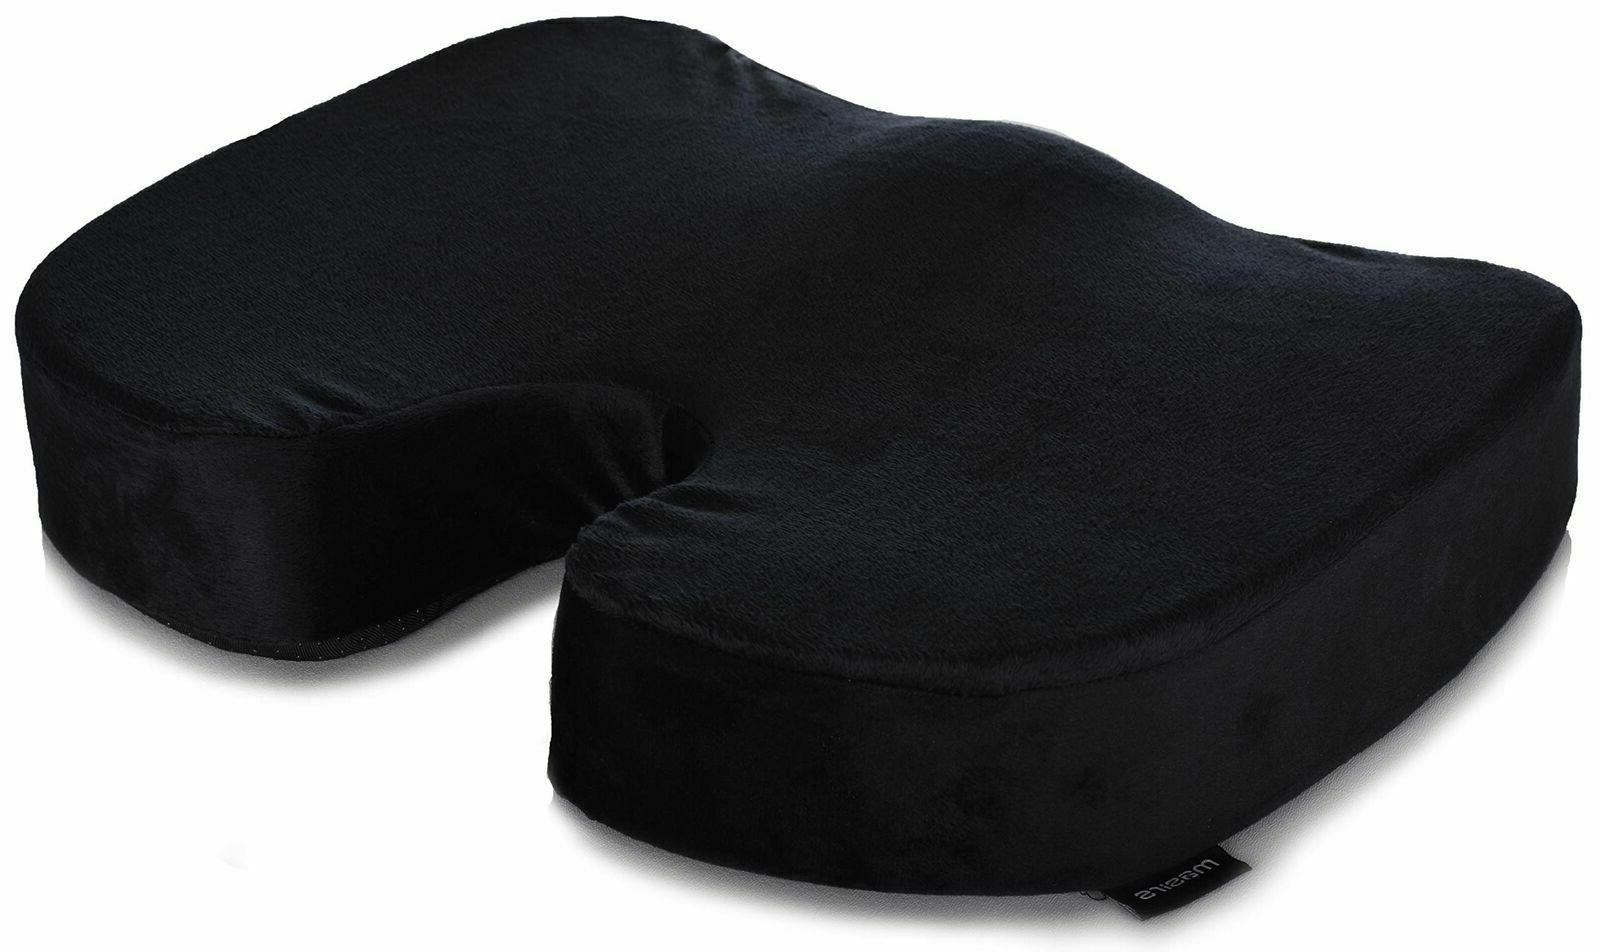 PERFECT Memory Foam Gel Cushion Office